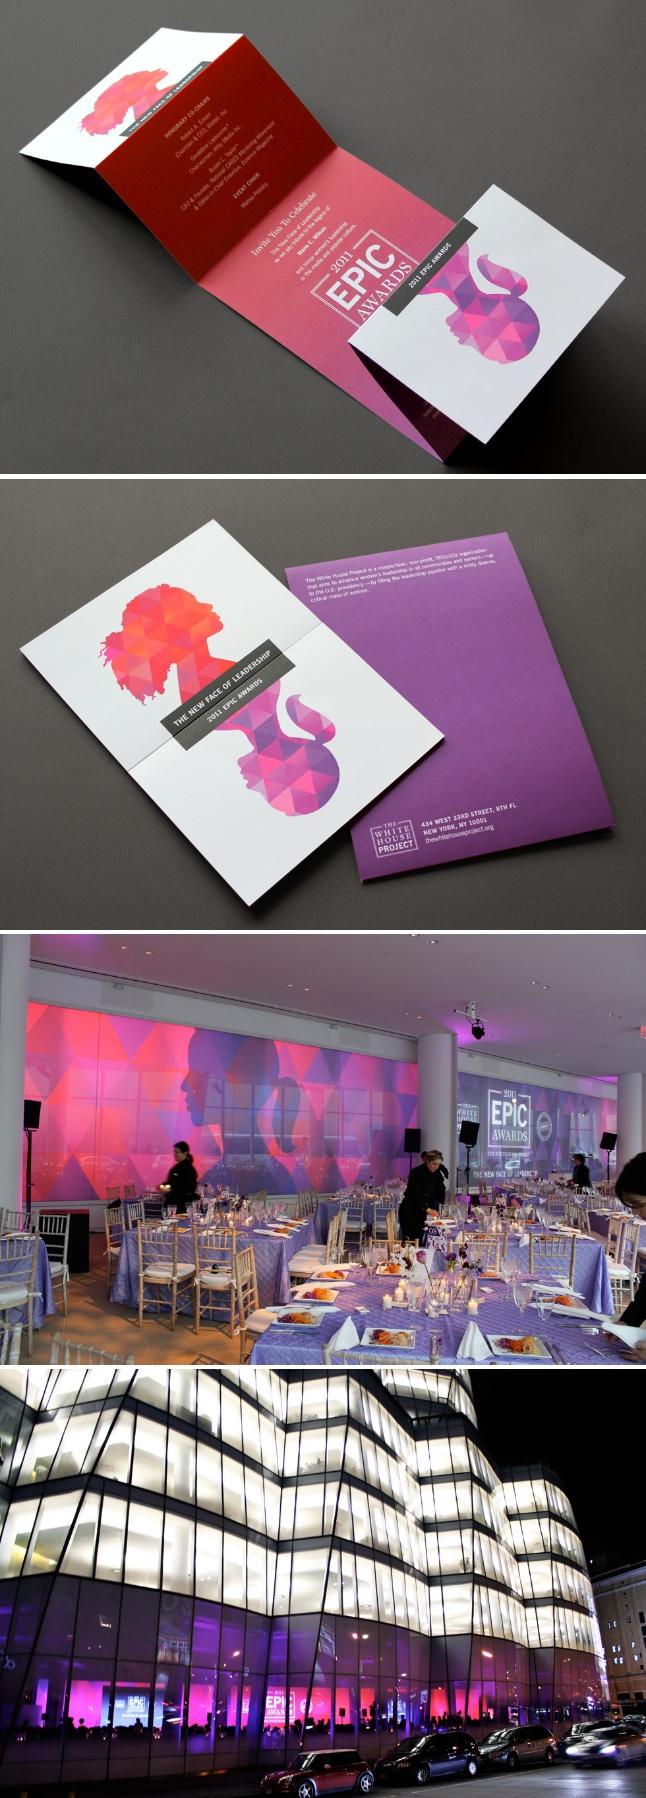 TWHP 2011 EPIC Awards | Hyperakt | http://www.hyperakt.com